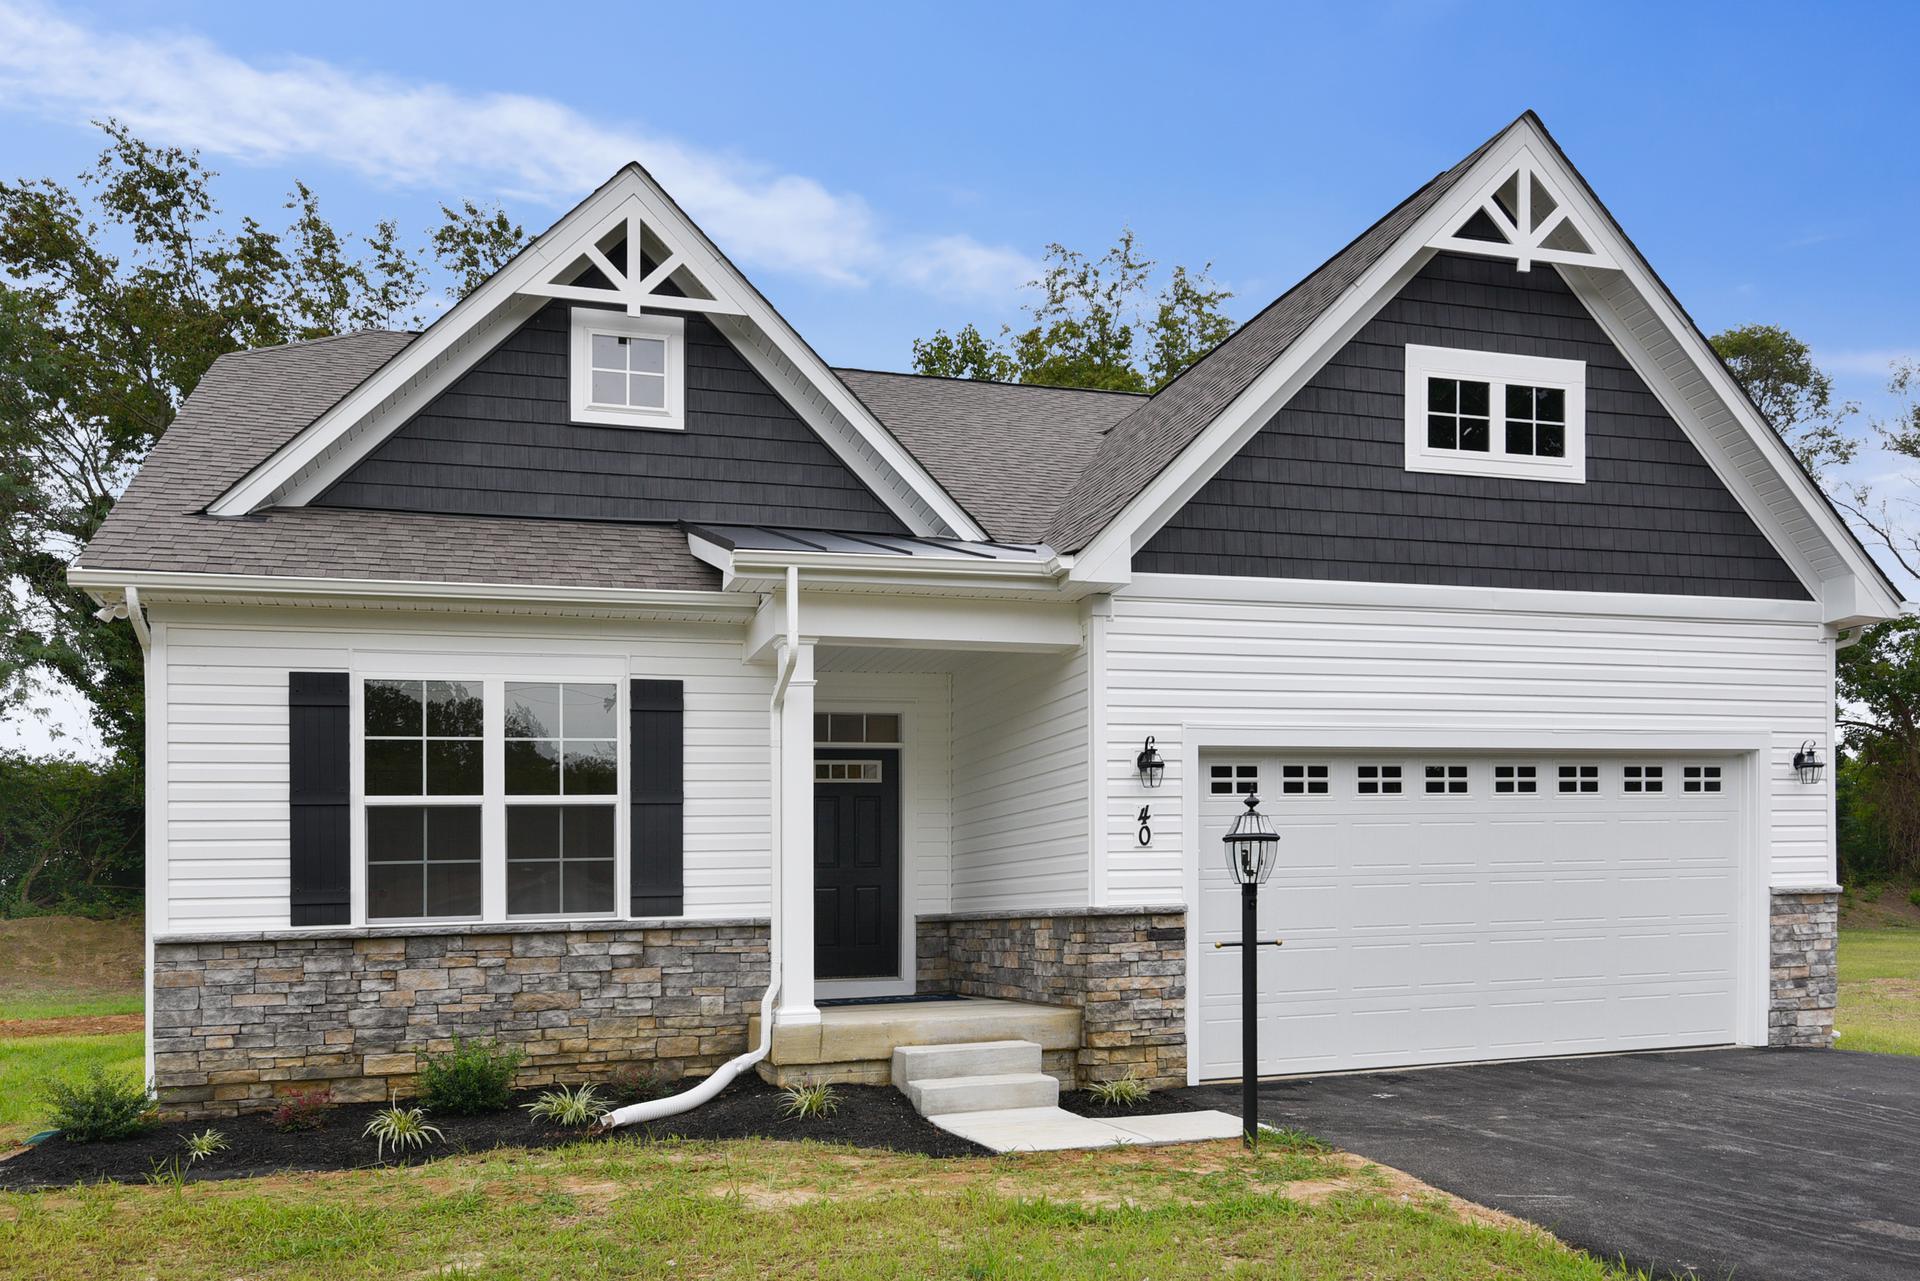 Ashland New Home in Pennsylvania